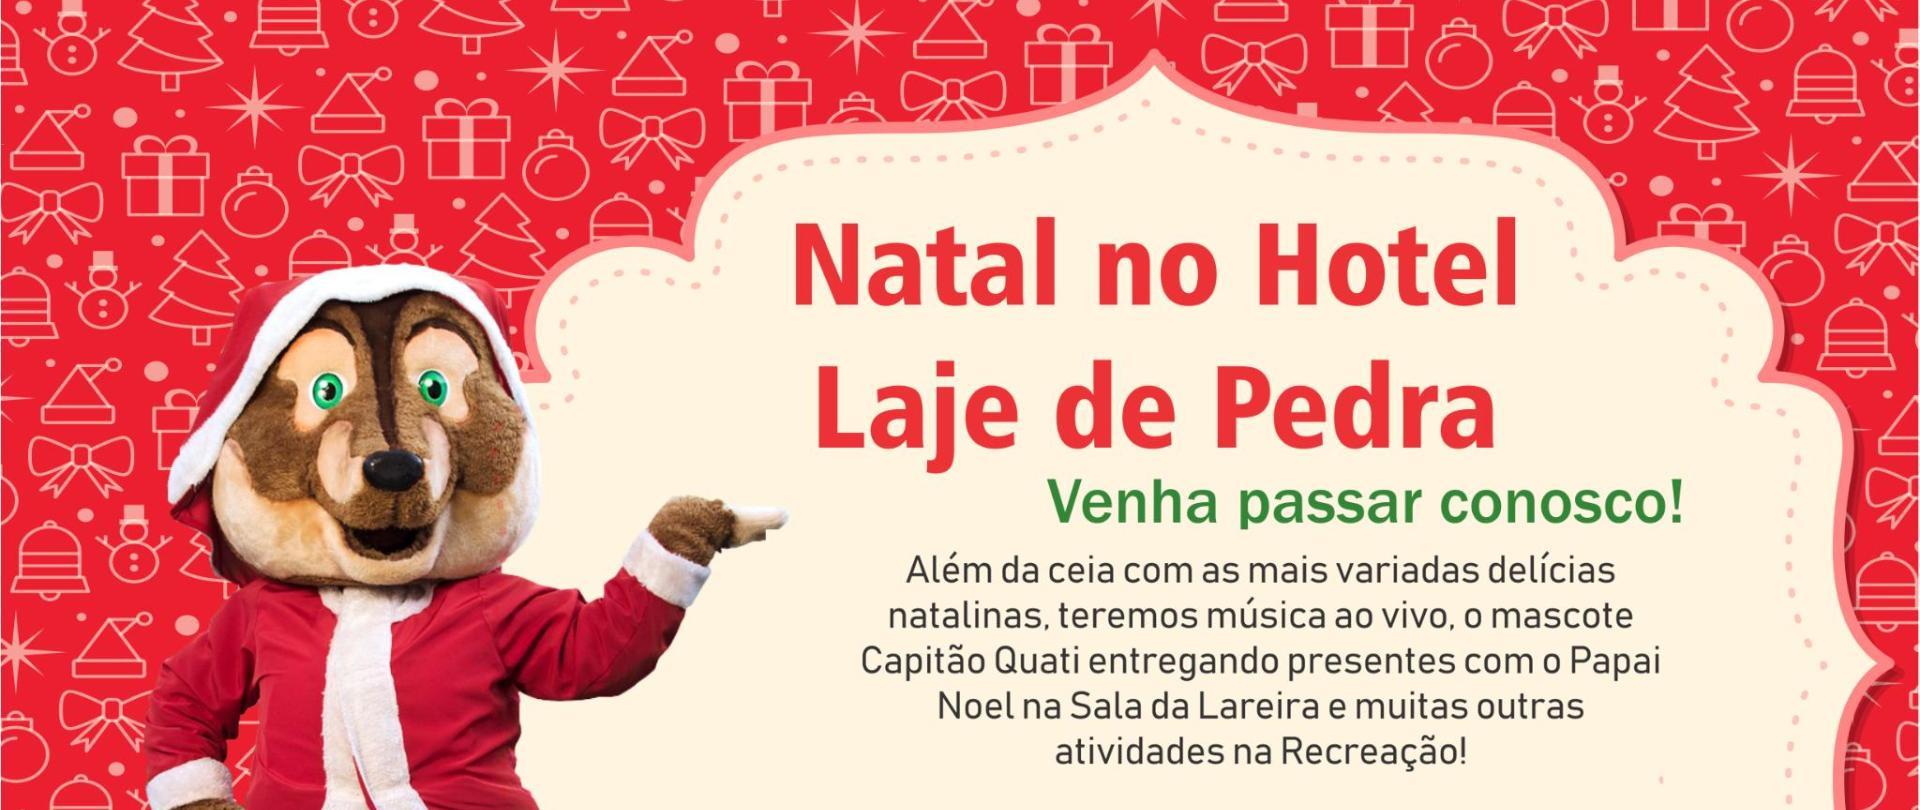 Natal Quati2LLLLLLLLLOKOKOKOKOKESSA.png